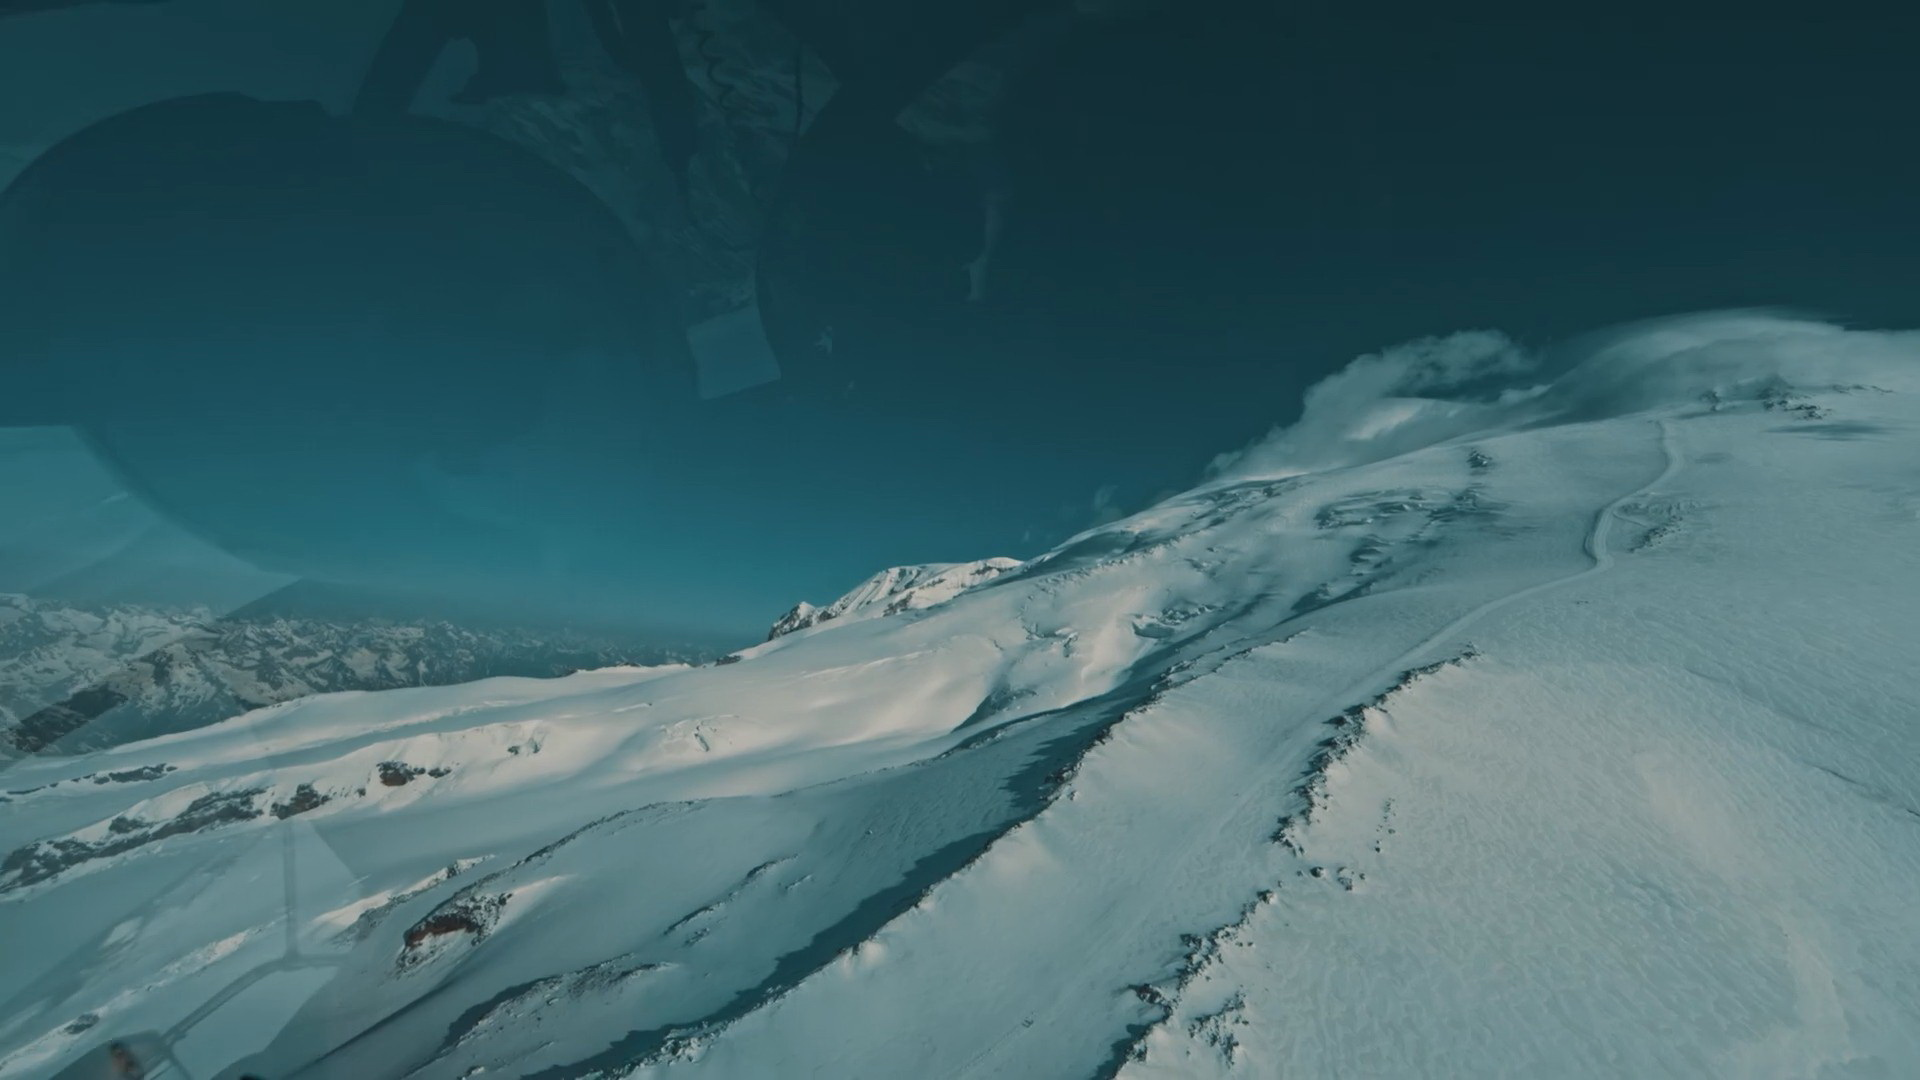 10.06.2015, Mount Elbrus